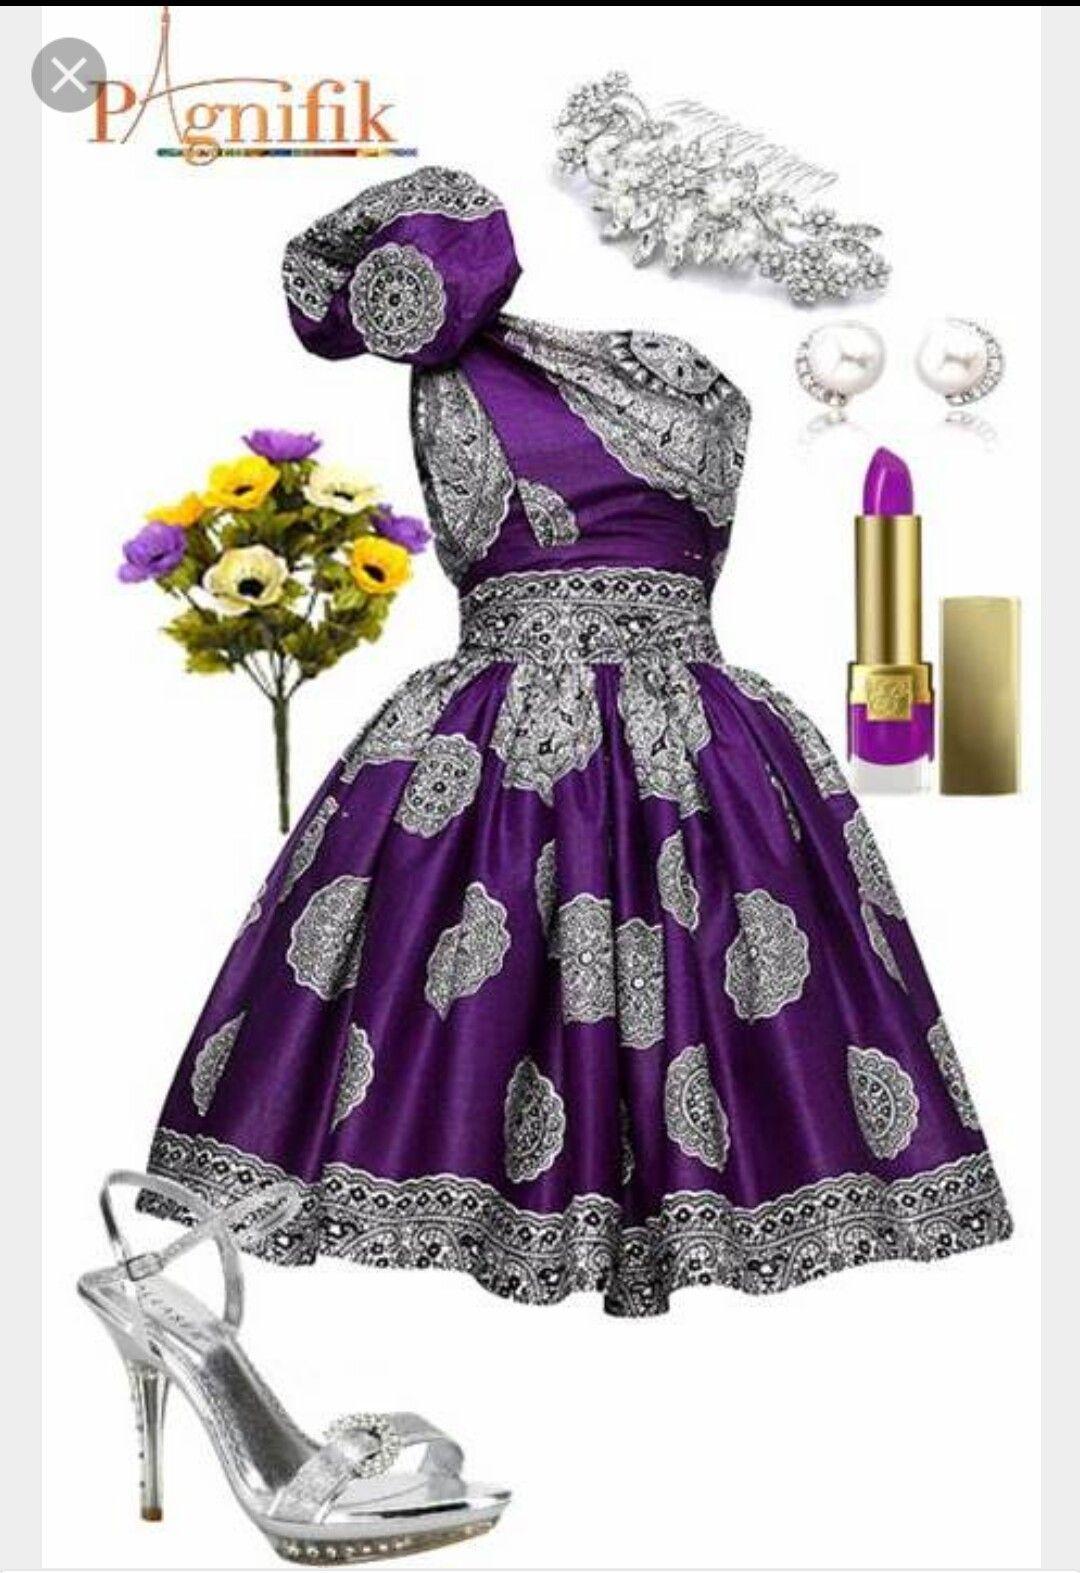 Idee de couleur | Weddings | Pinterest | Moda africana, África y ...